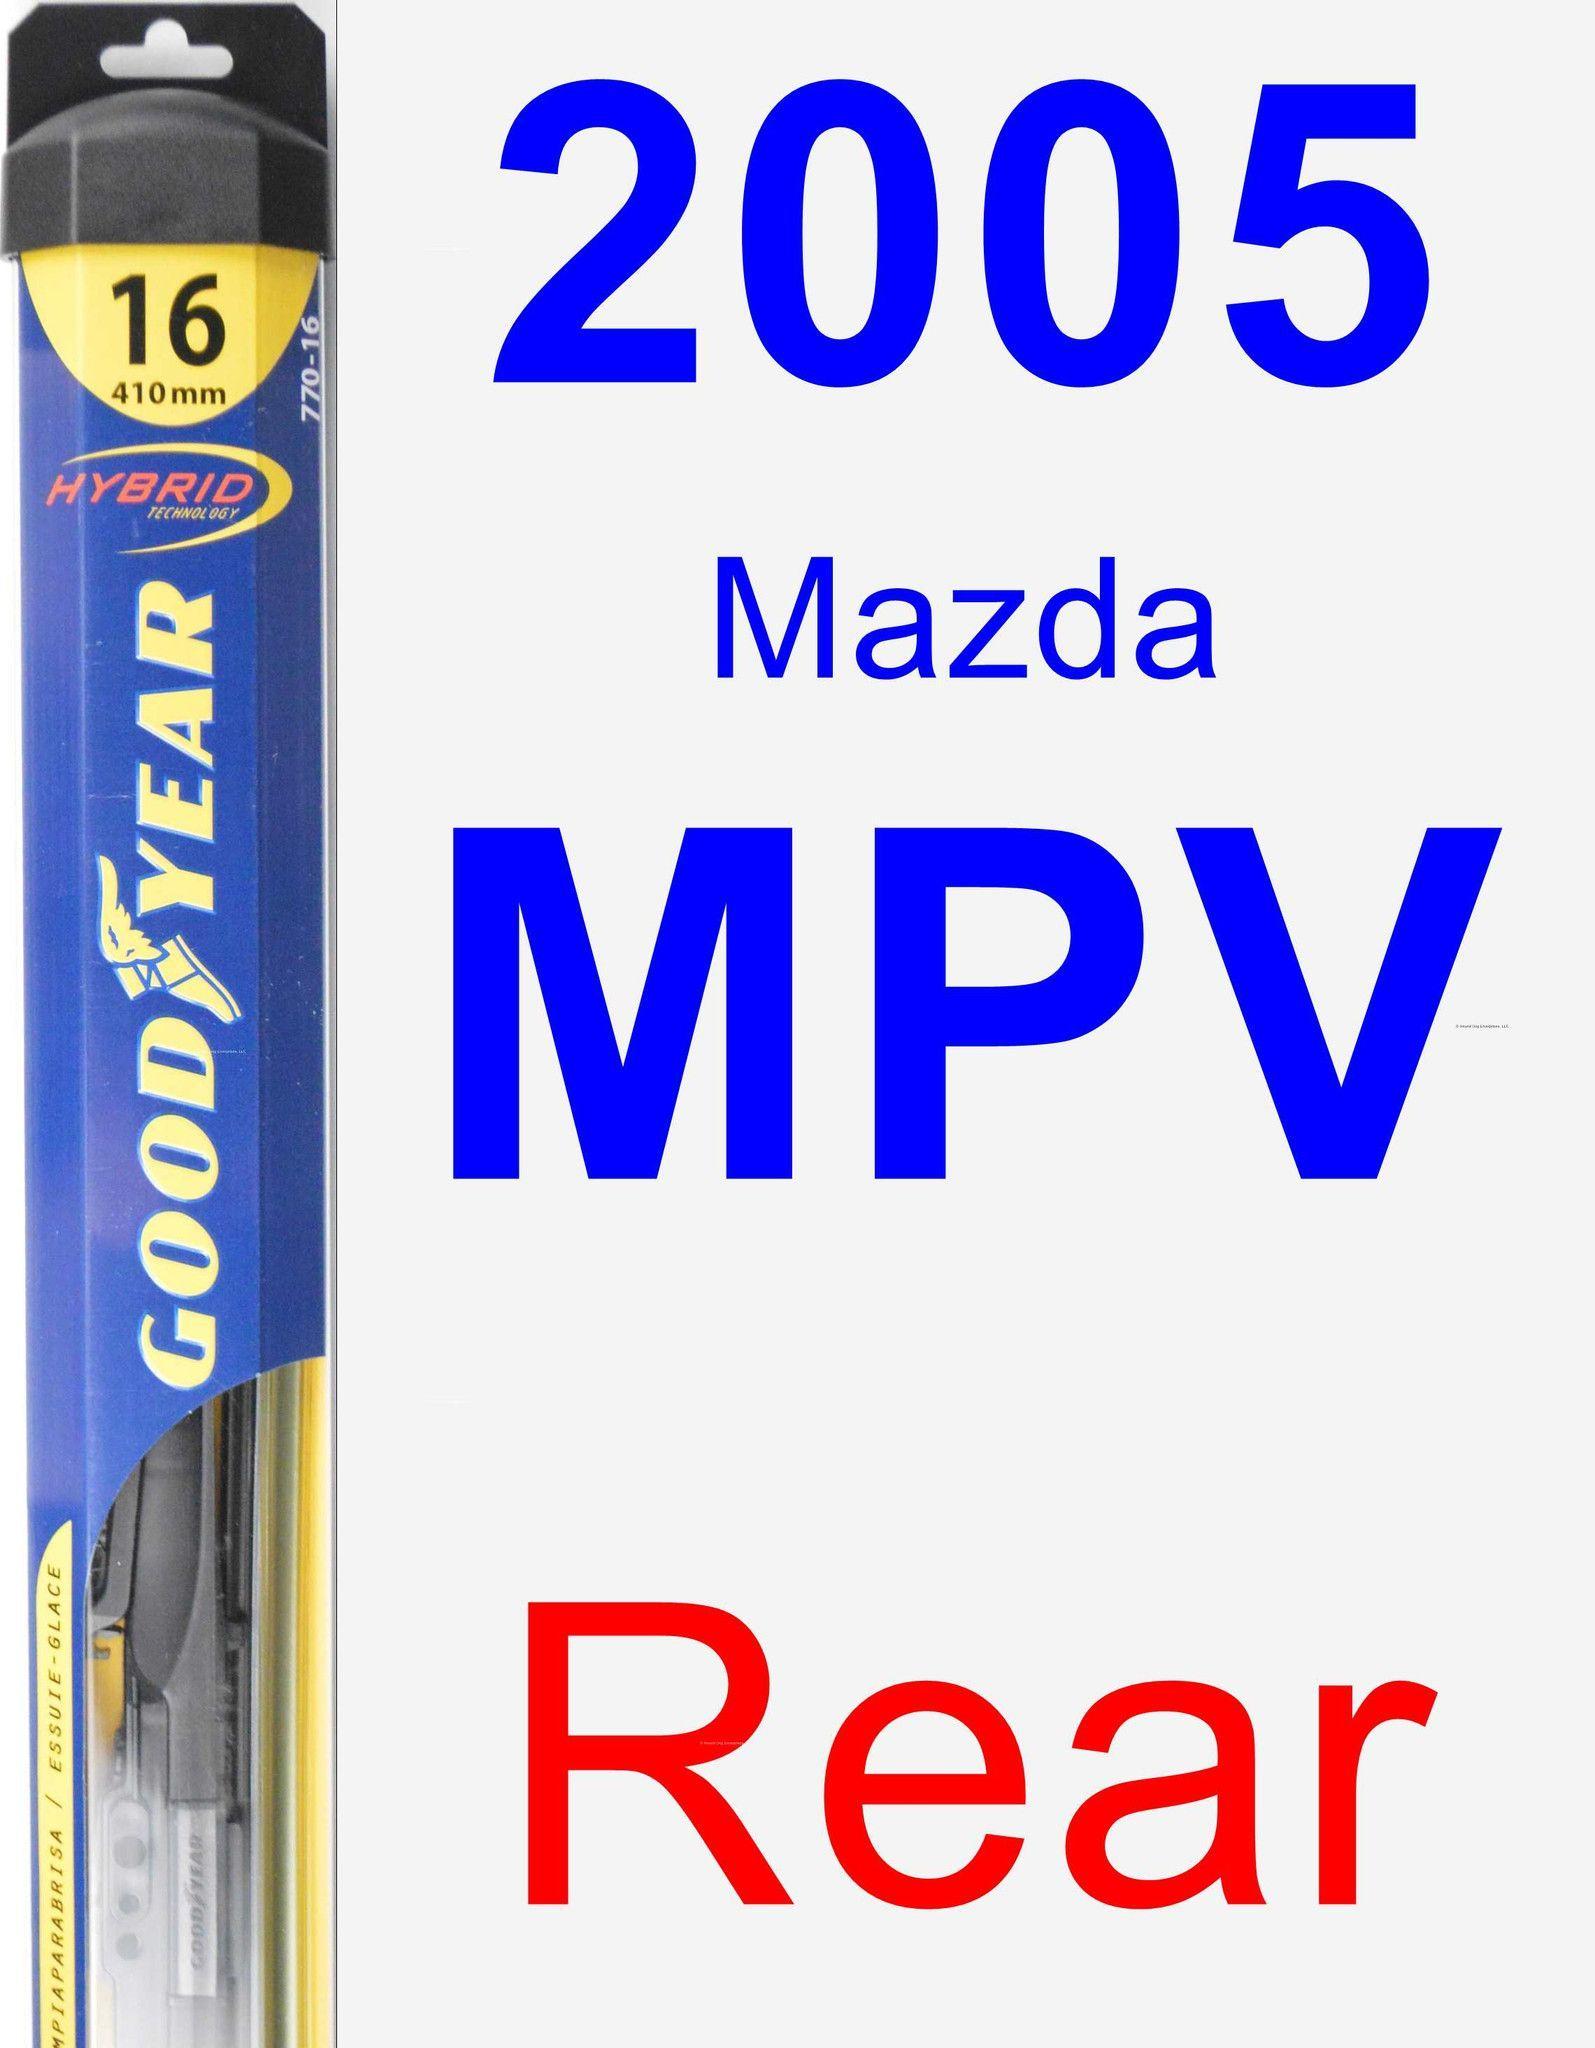 Rear Wiper Blade for 2005 Mazda MPV Hybrid Lexus lx570